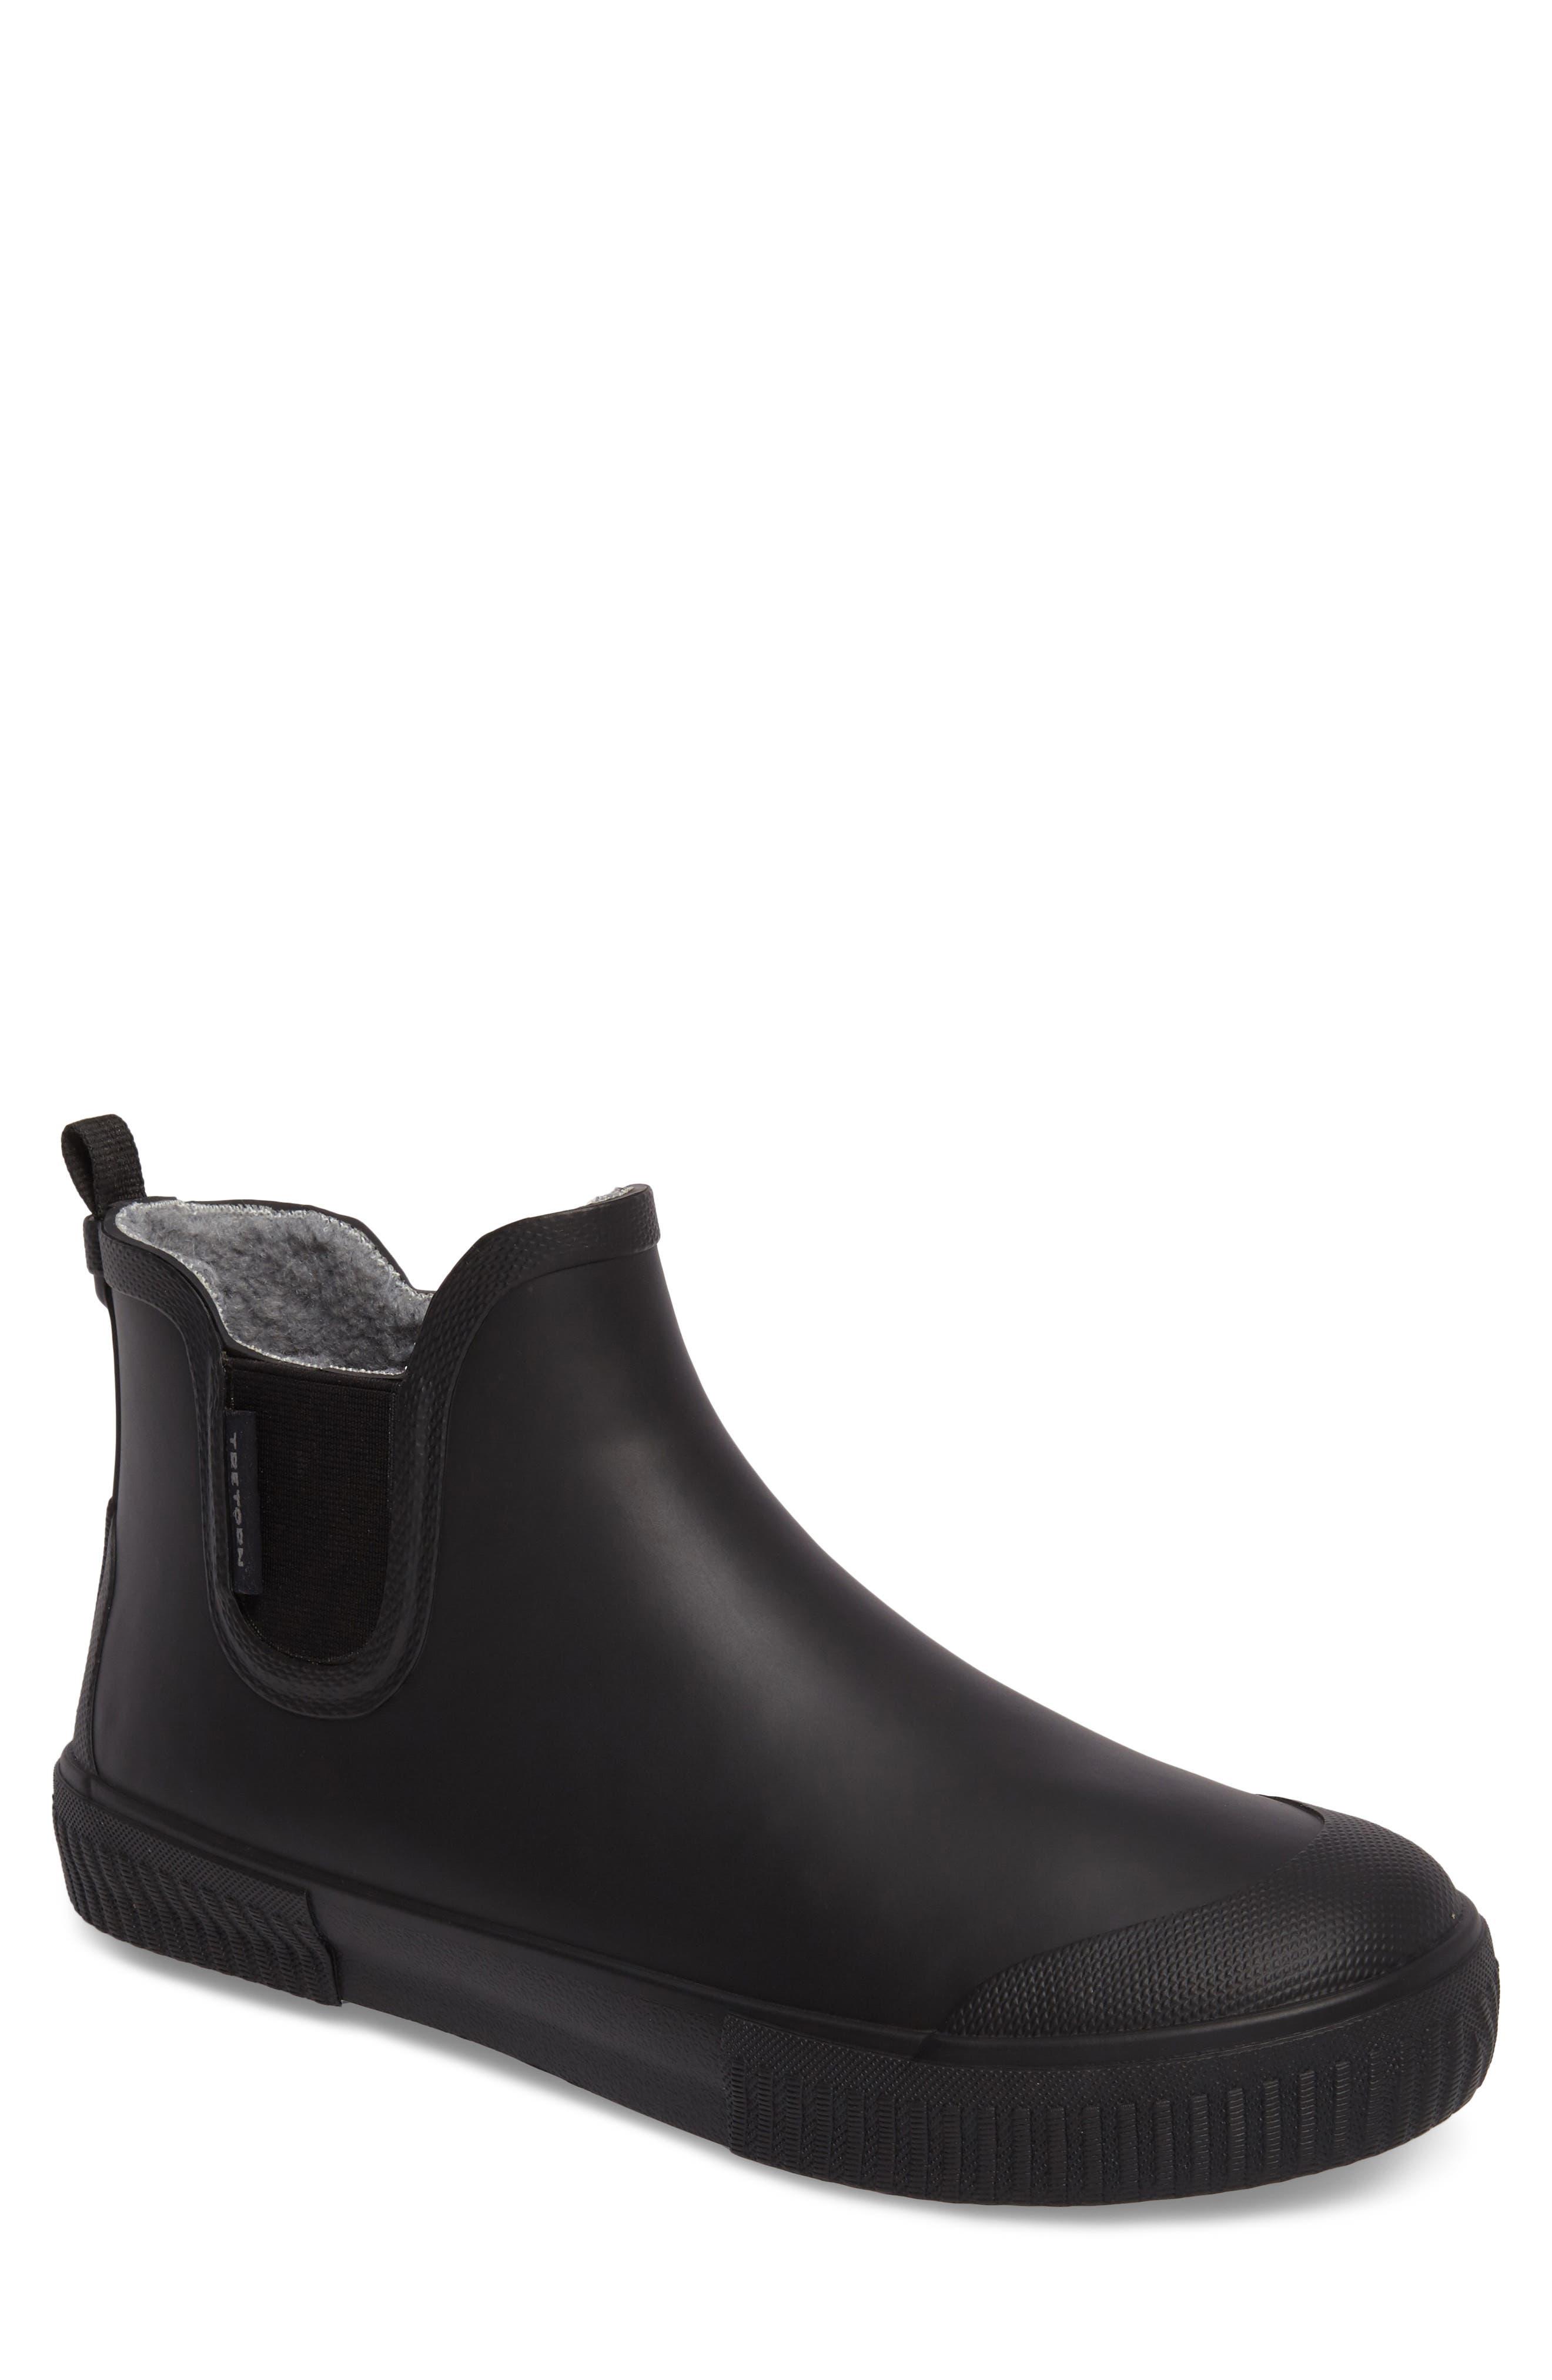 TRETORN Guswnt Chelsea Waterproof Boot, Main, color, BLACK/ BLACK